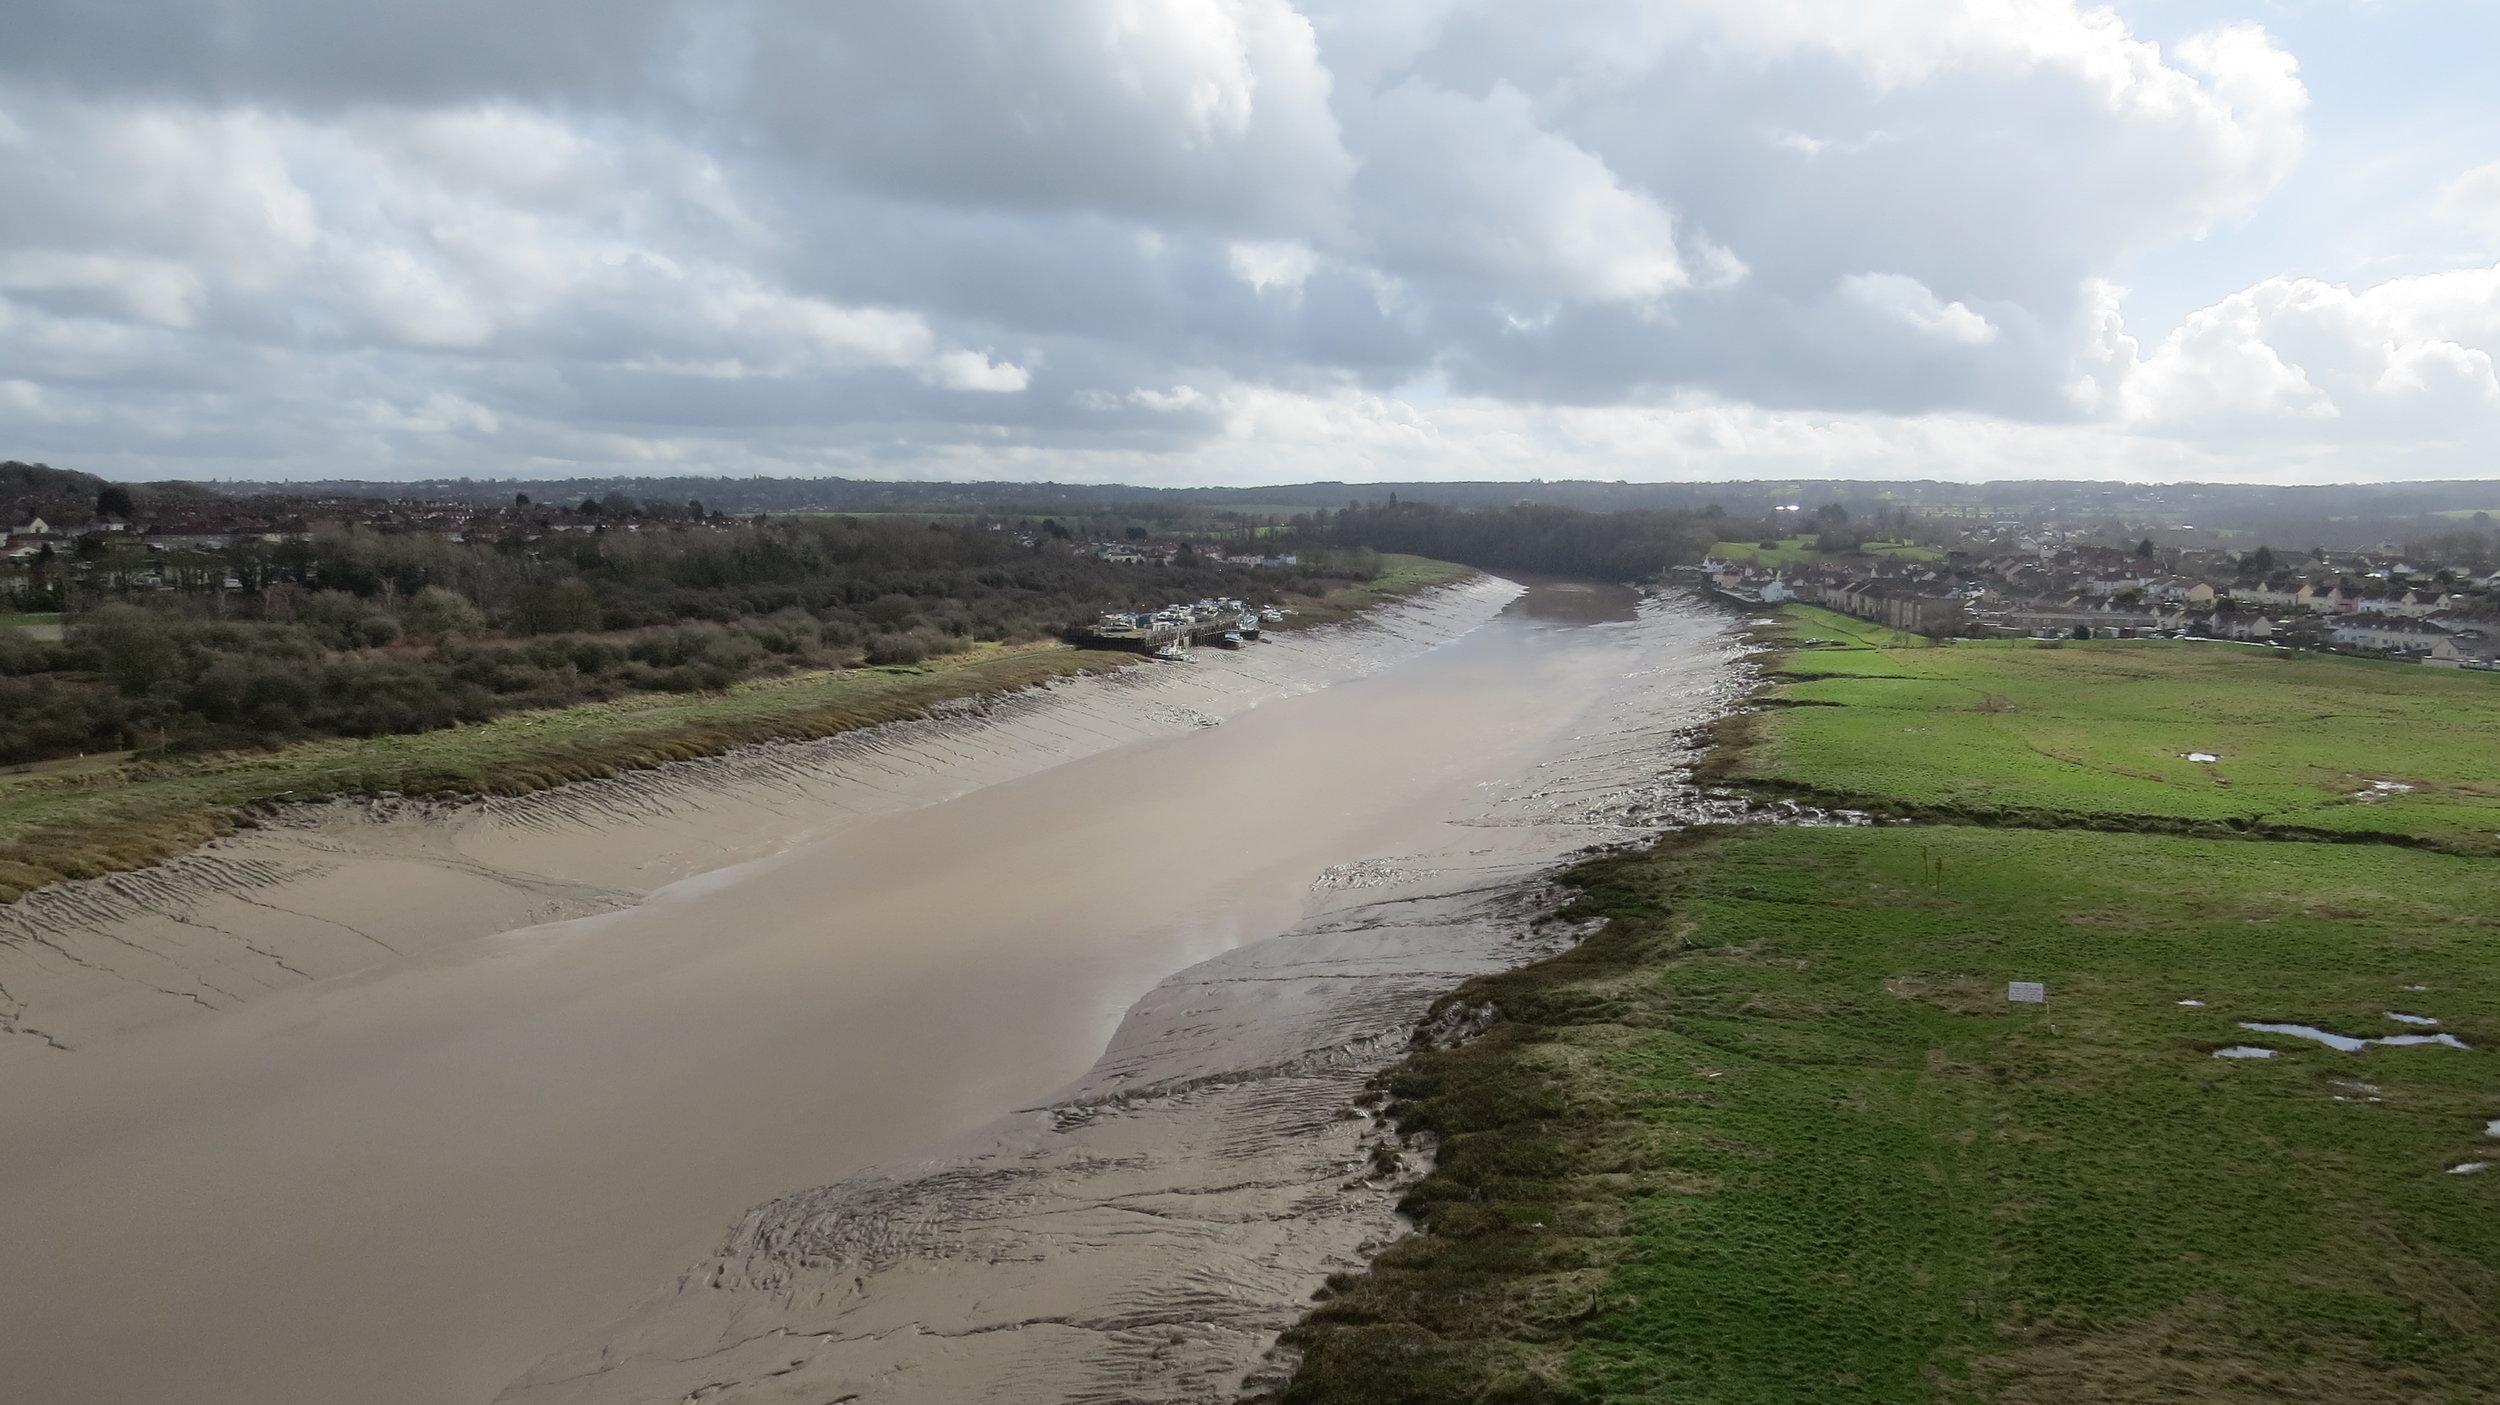 View from Avon Bridge